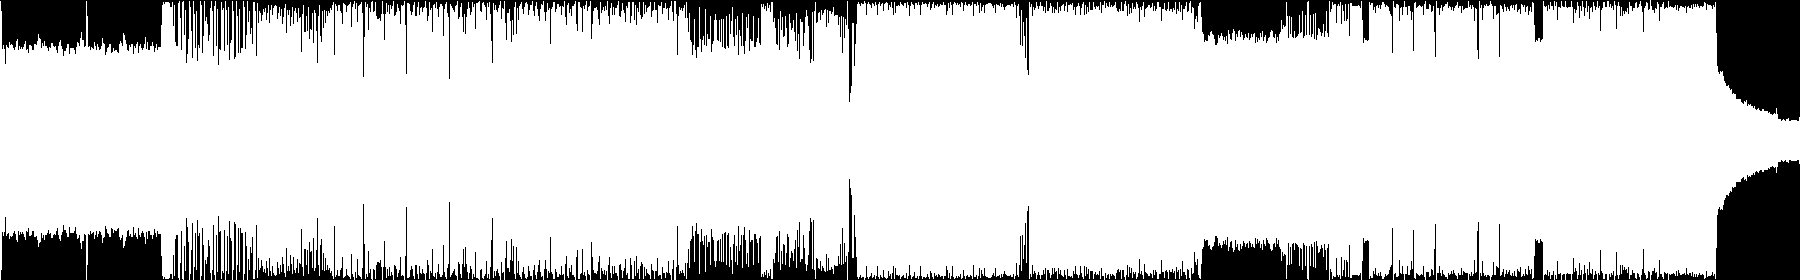 Charta - Paper DnB audio waveform